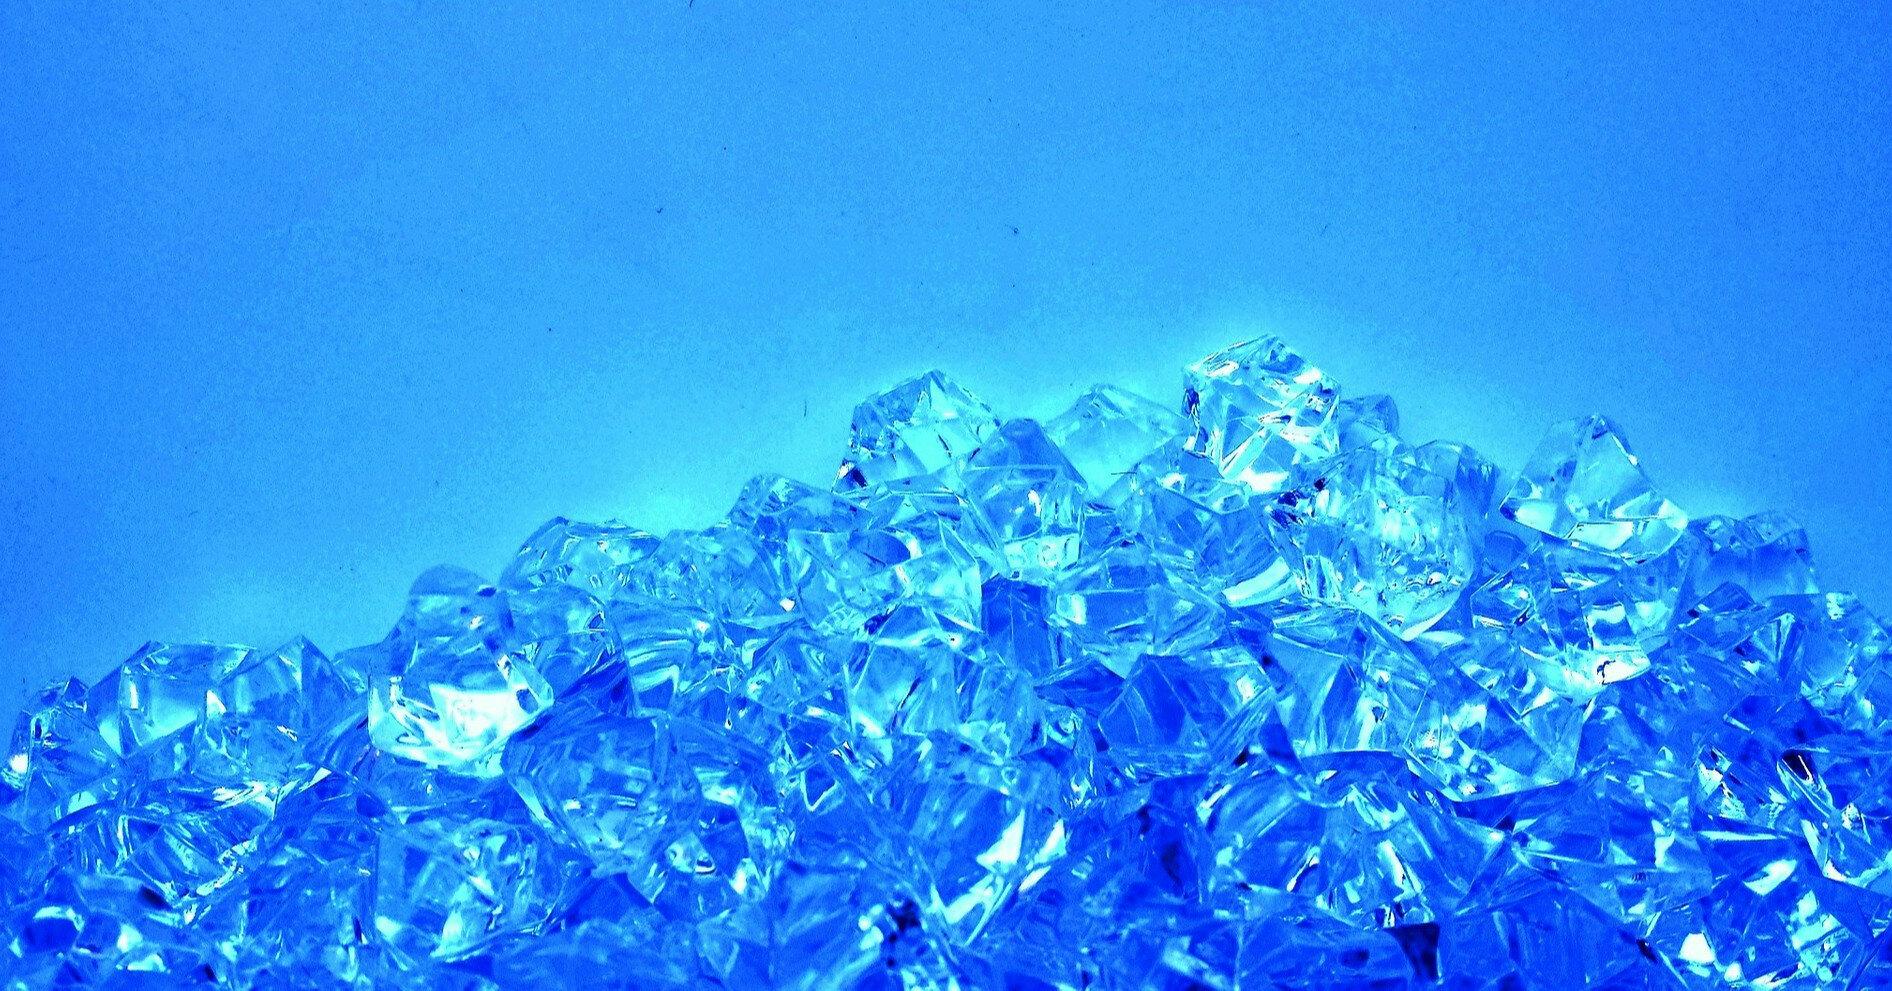 Африканцы попытались разбогатеть на фальшивых алмазах